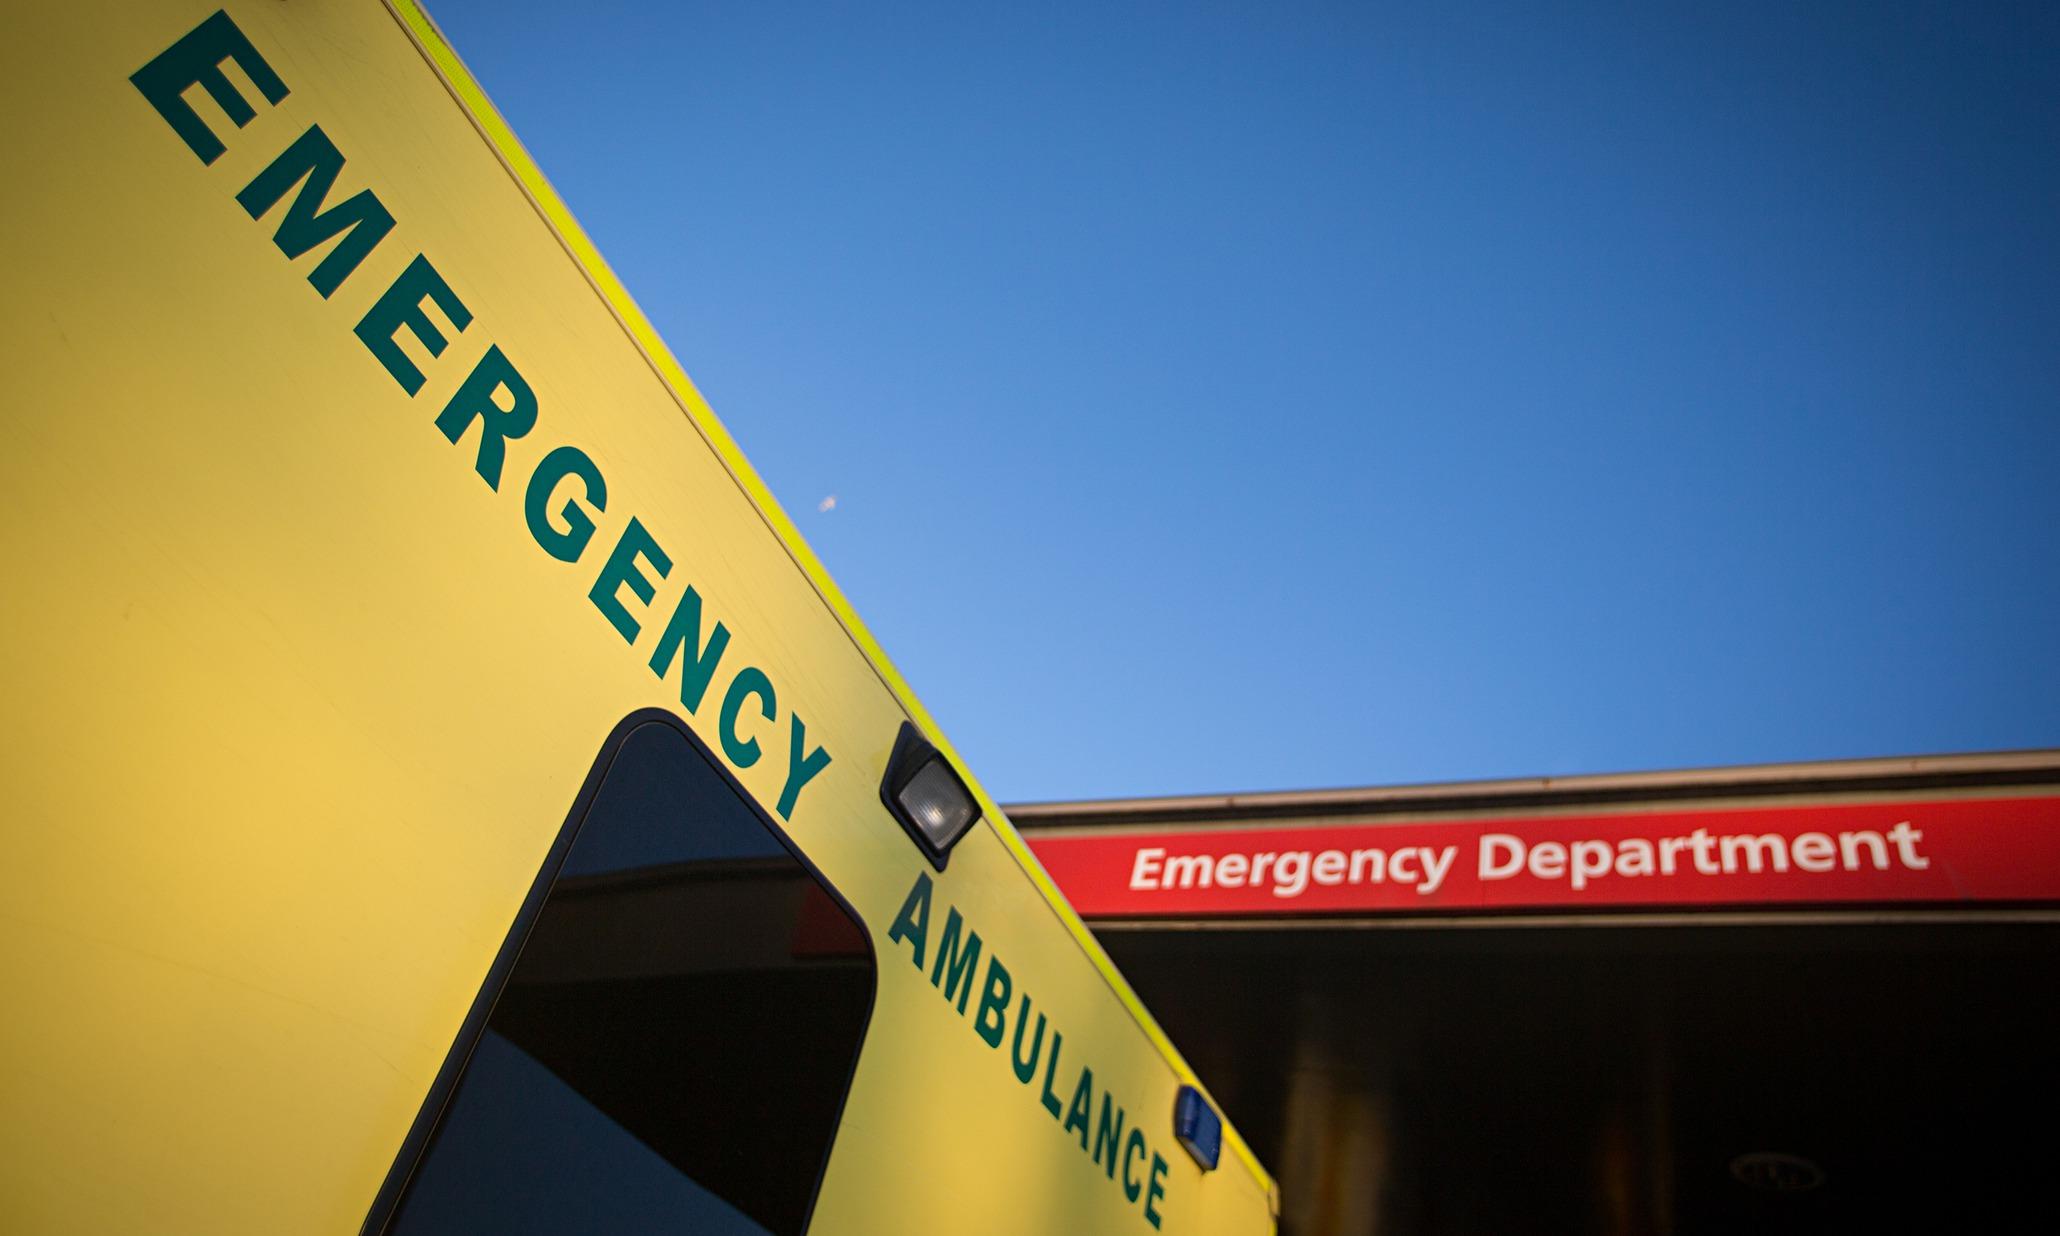 Acute Hospital Trusts